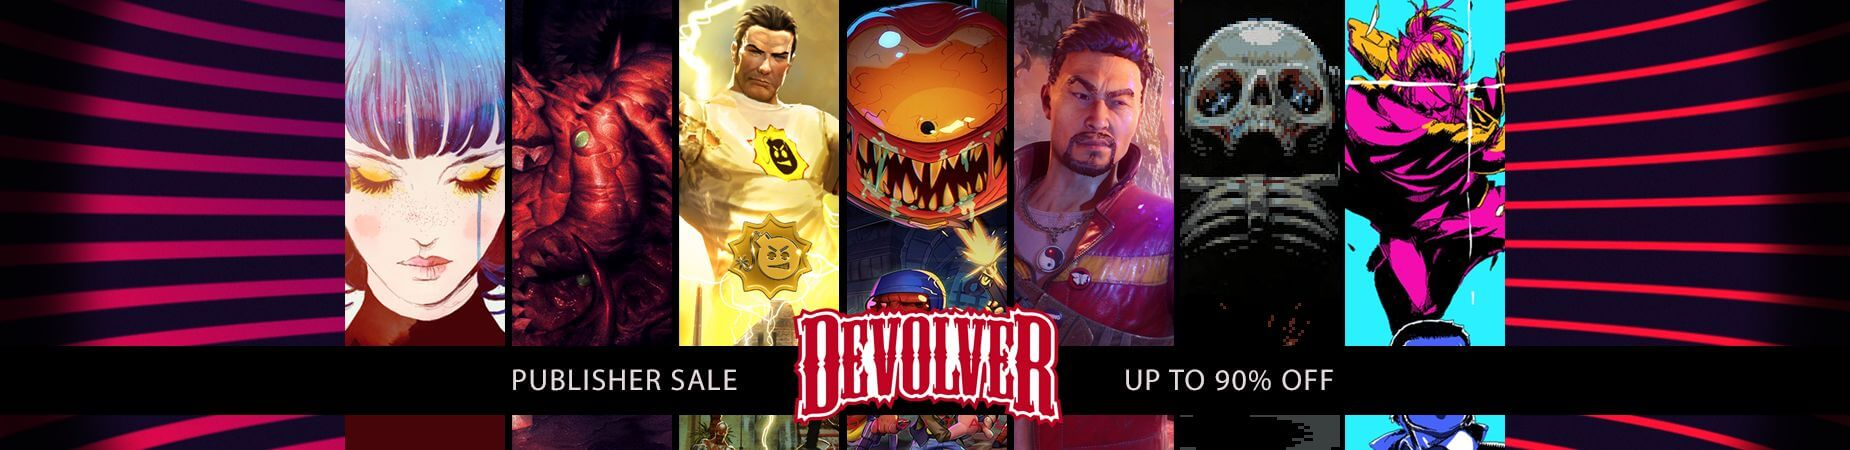 Devolver-2021-Steam-Publisher-Sale